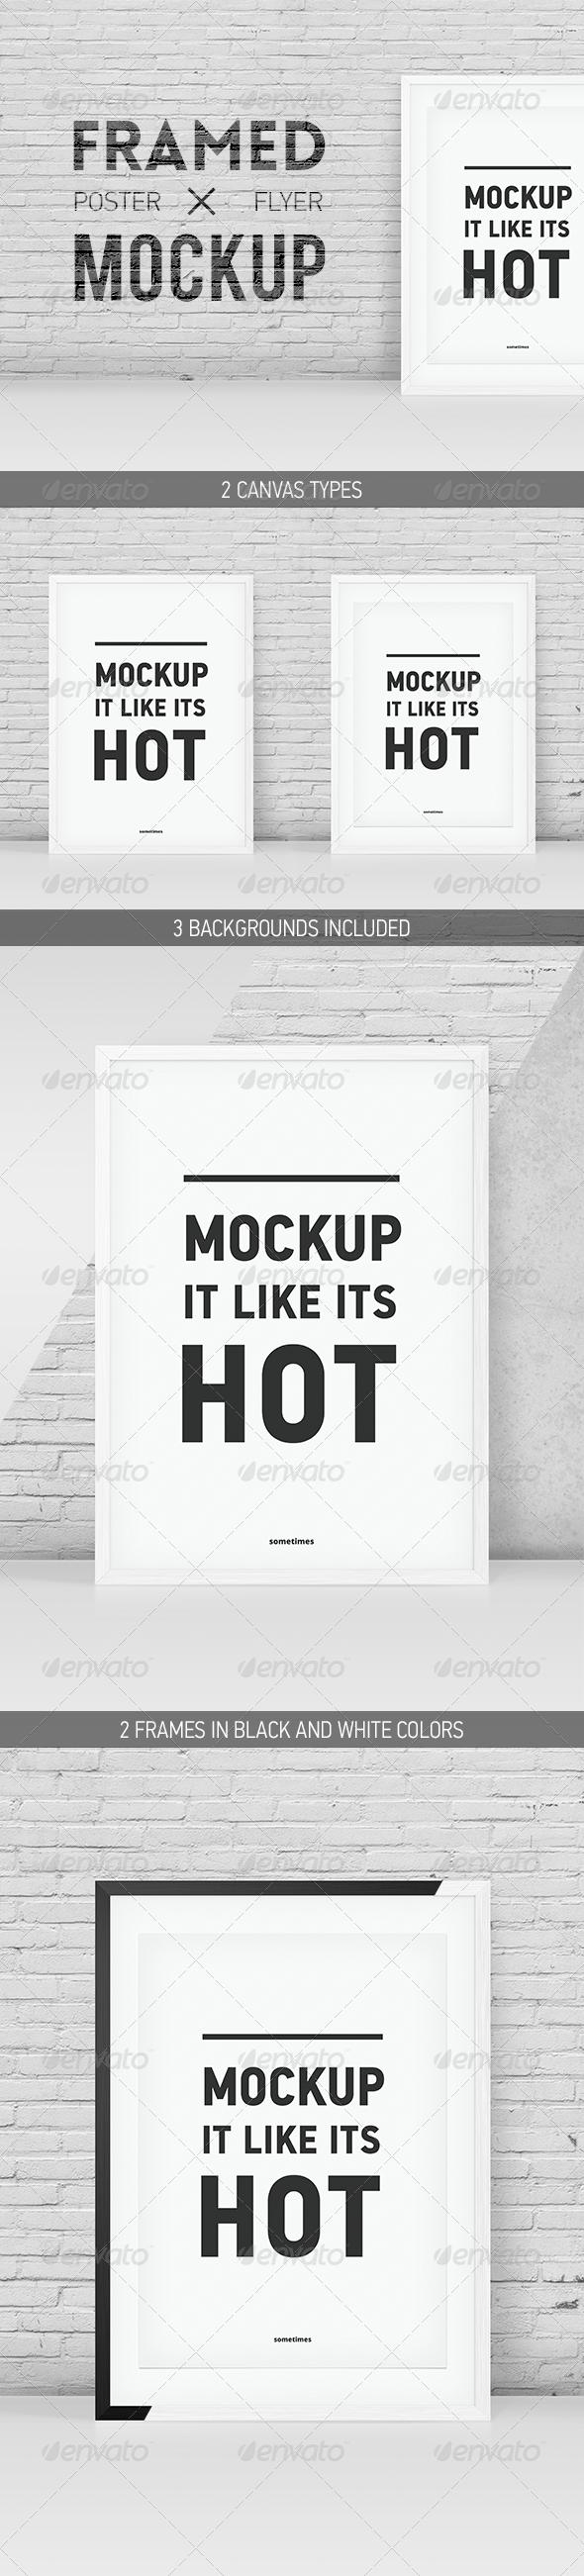 Minimalistic Framed Poster Flyer Mockup - Posters Print